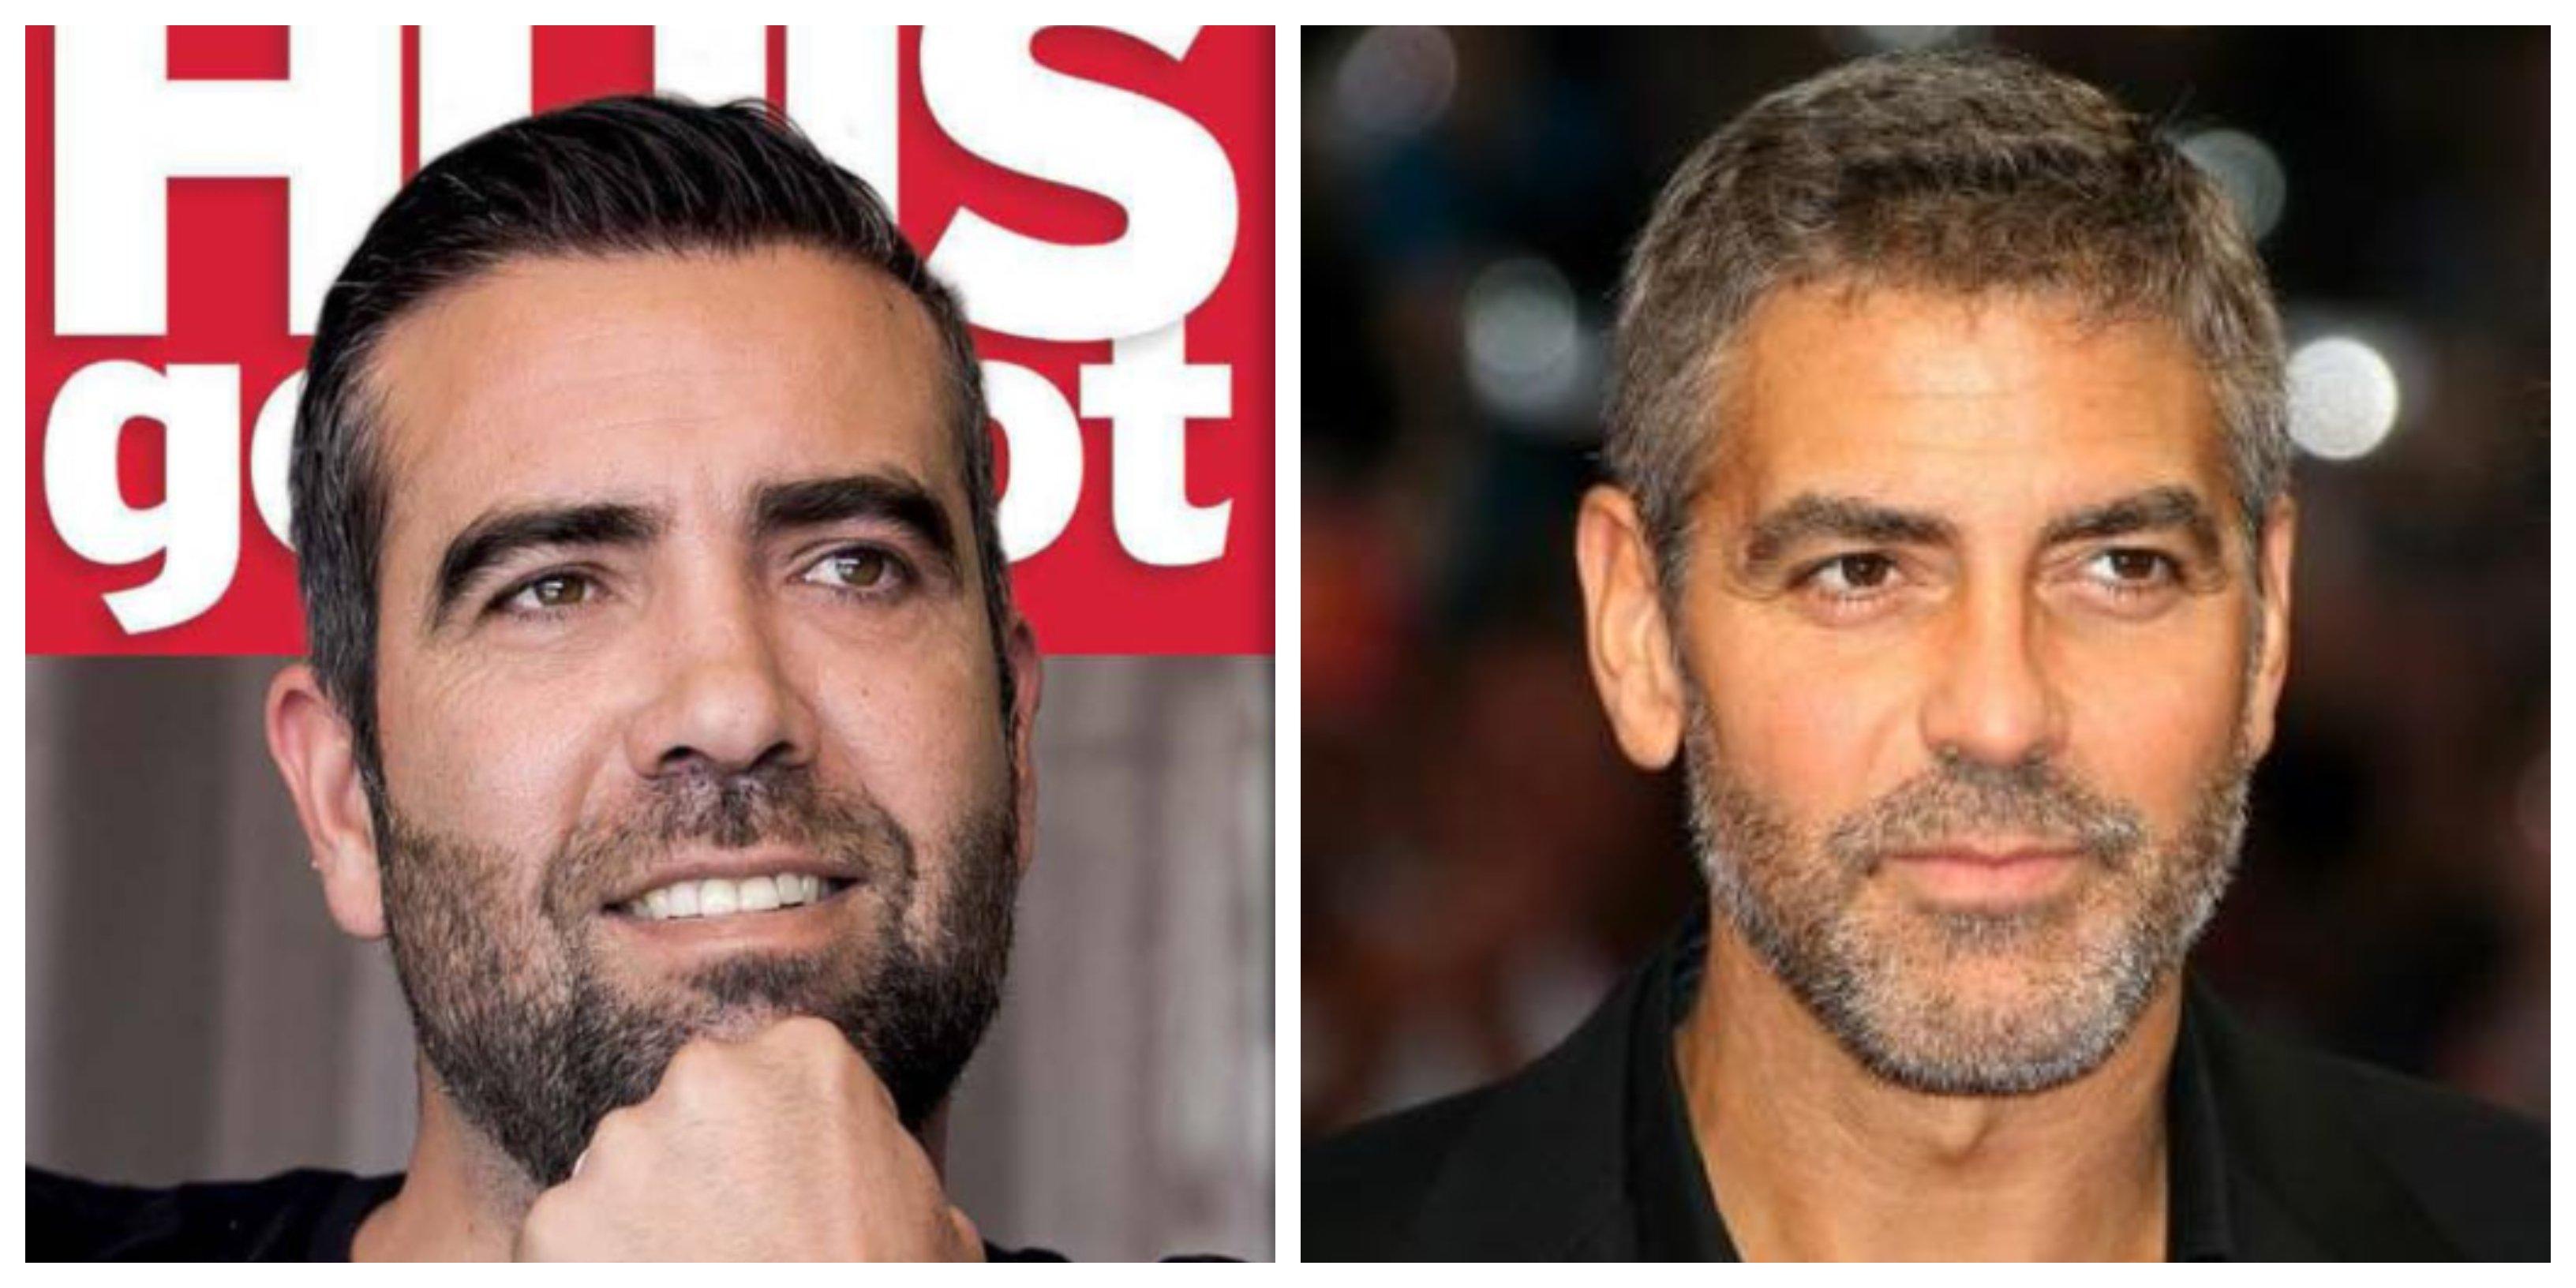 Jo Black / George Clooney